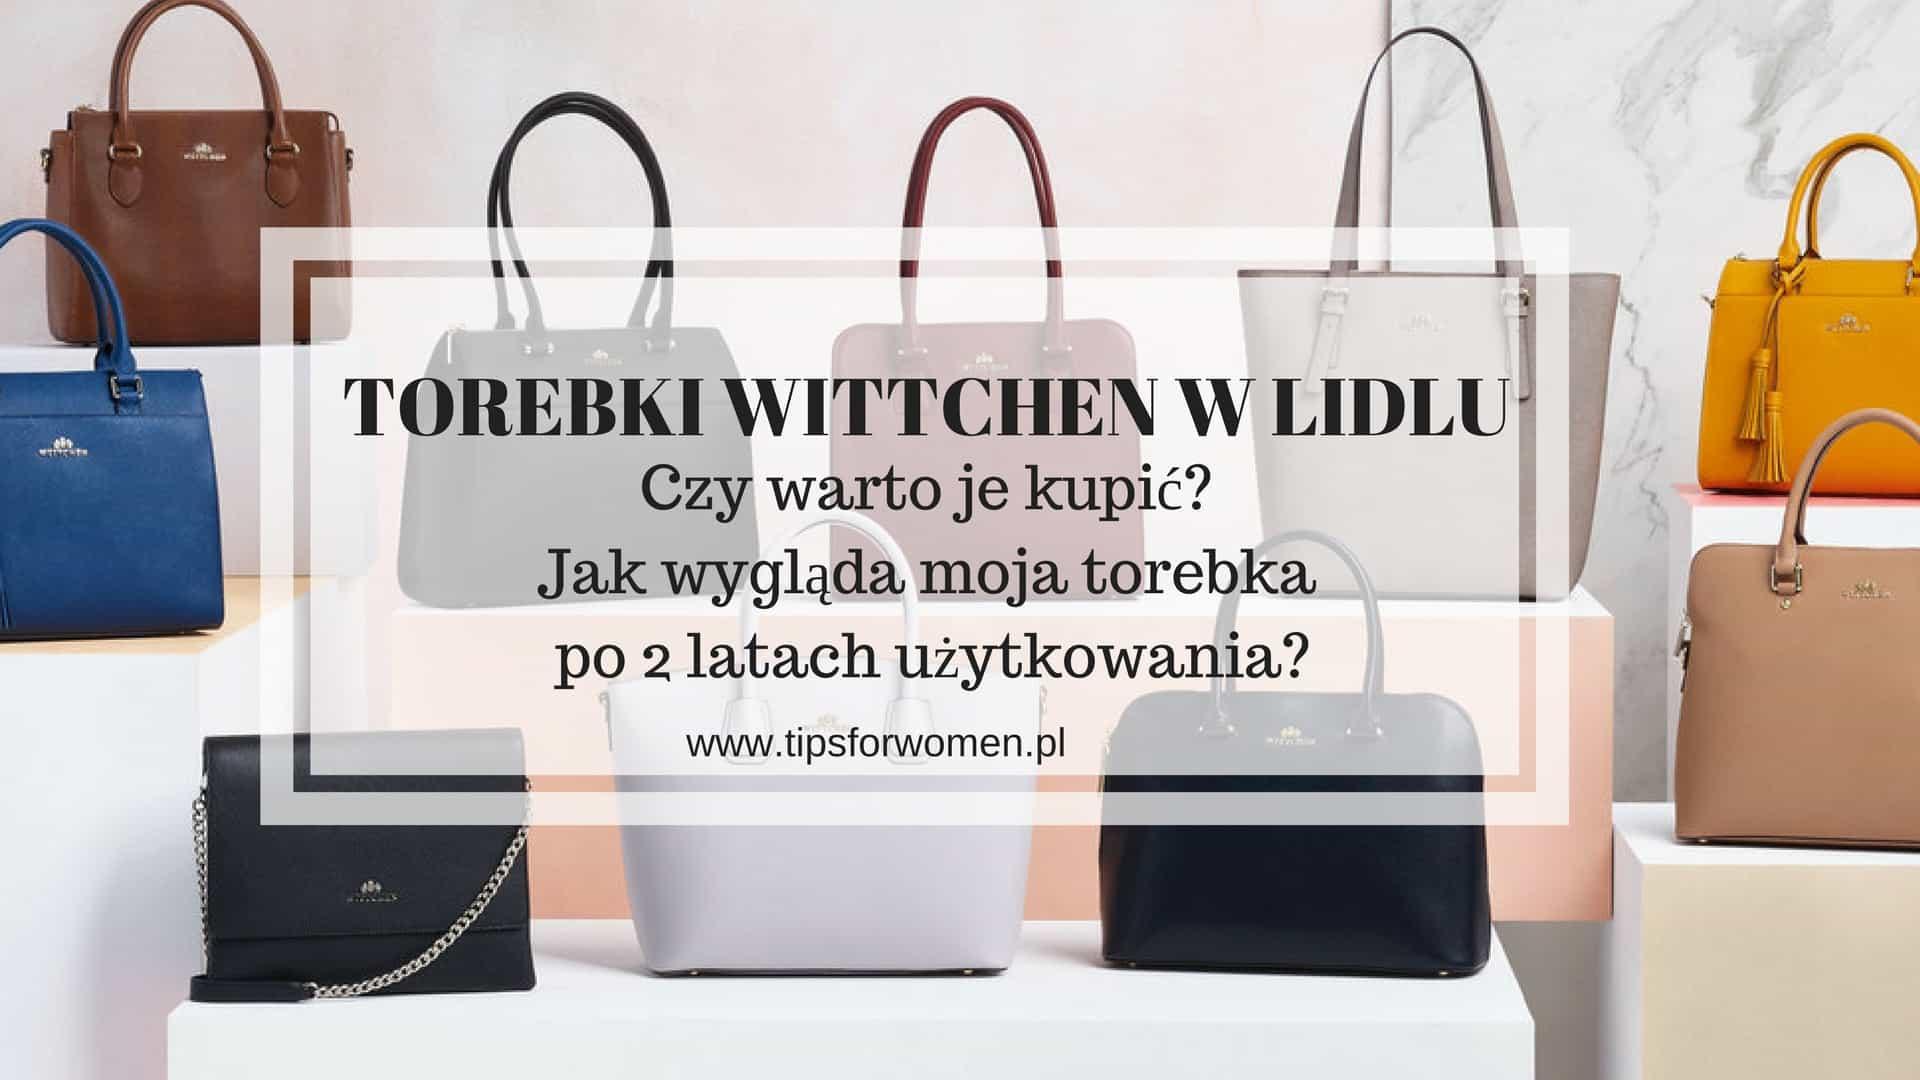 8834da938e9f0 Torebki Wittchen w Lidlu - Warto kupić